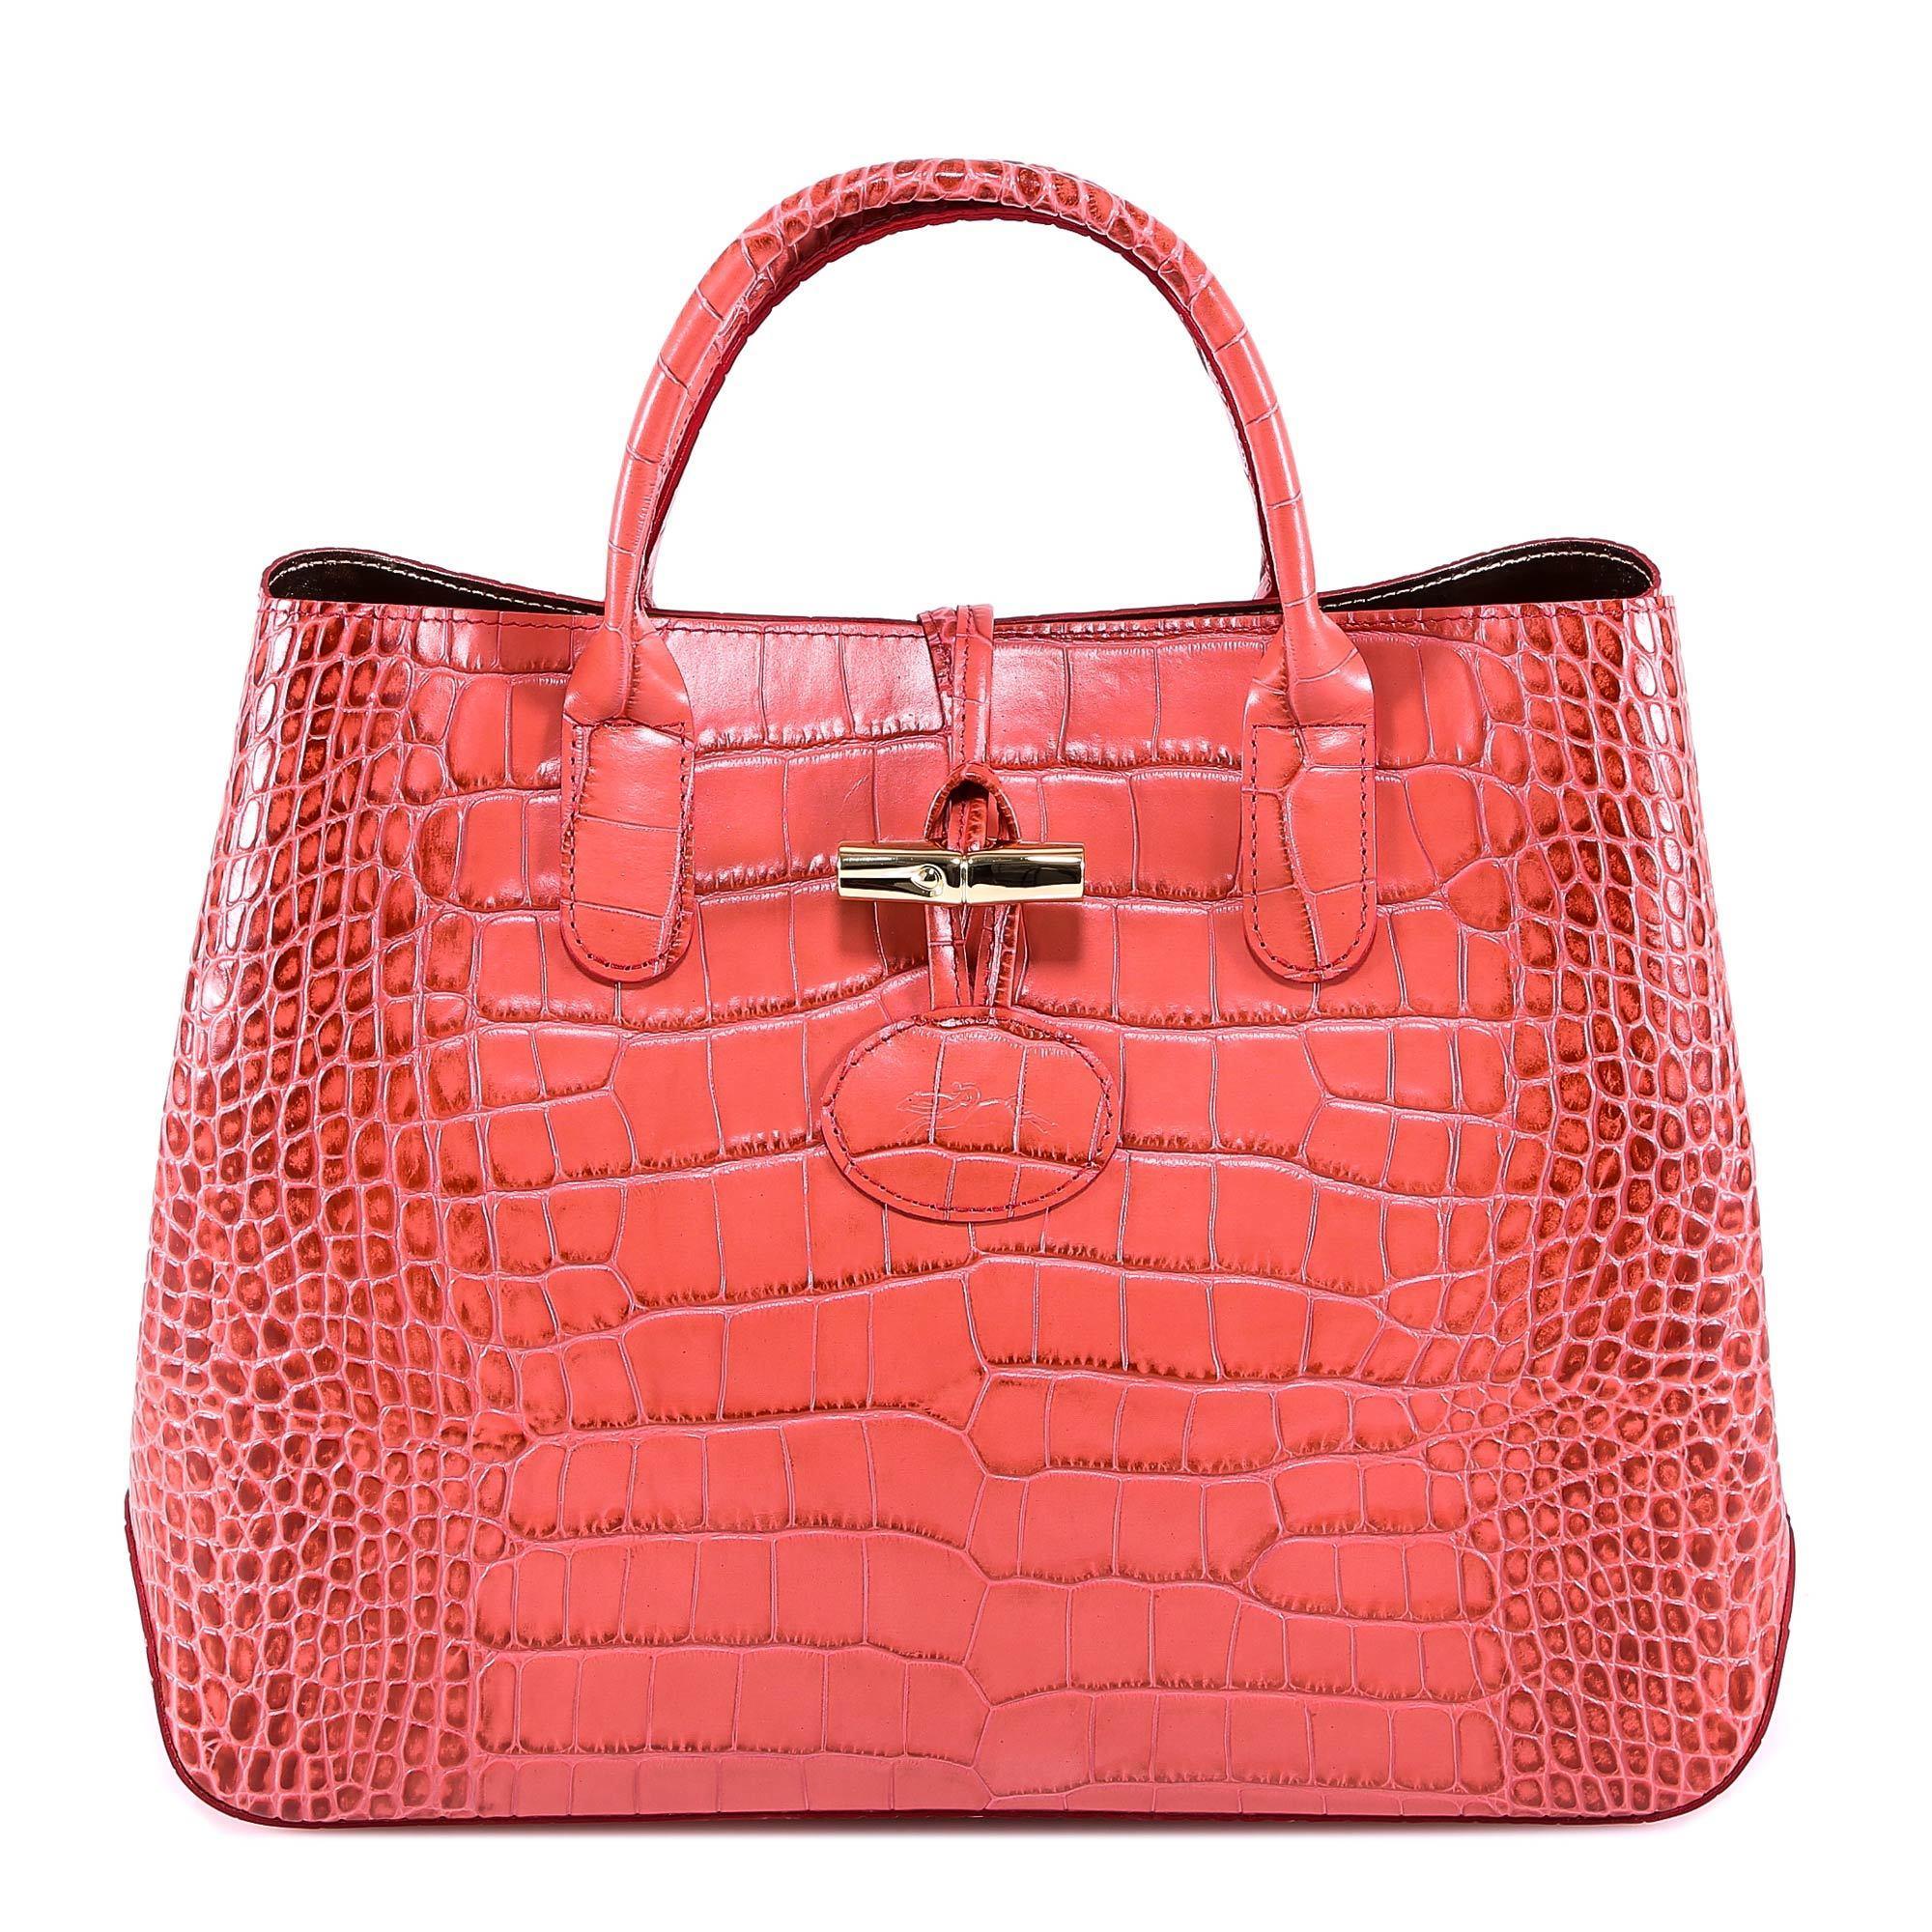 Longchamp Roseau Crocodile S Tote Bag In Pink